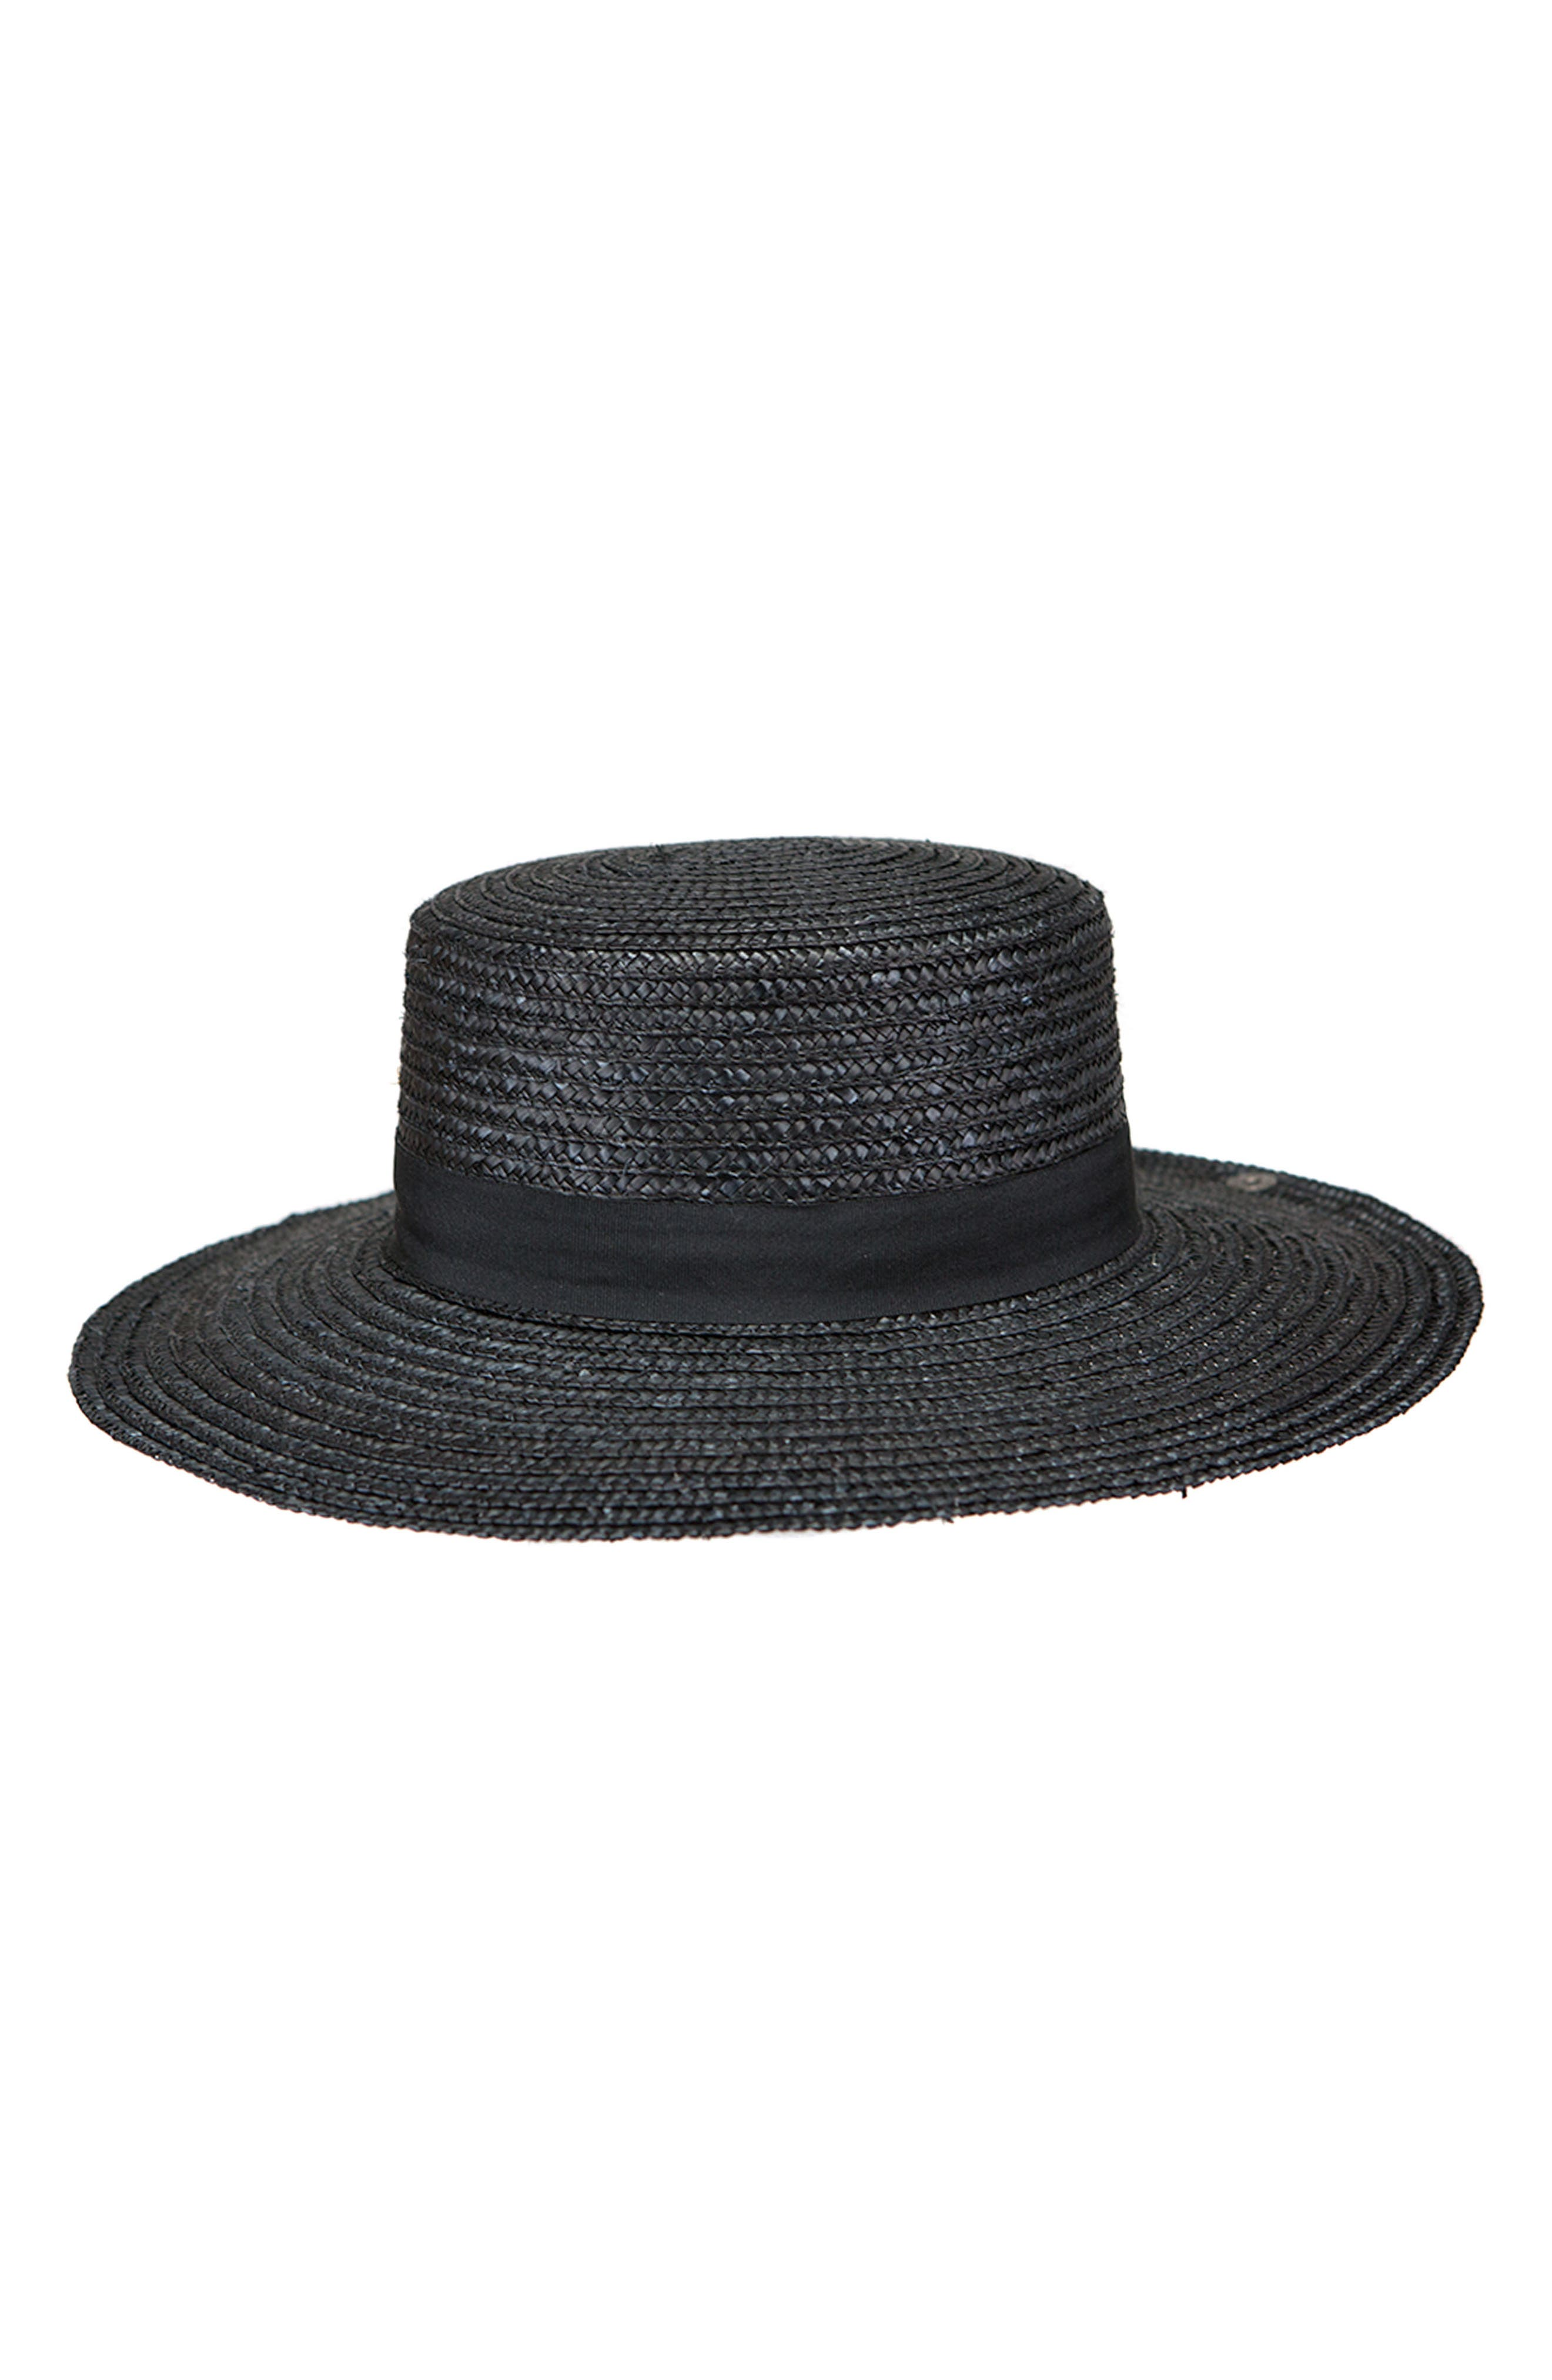 Lupe Straw Resort Hat,                         Main,                         color, BLACK